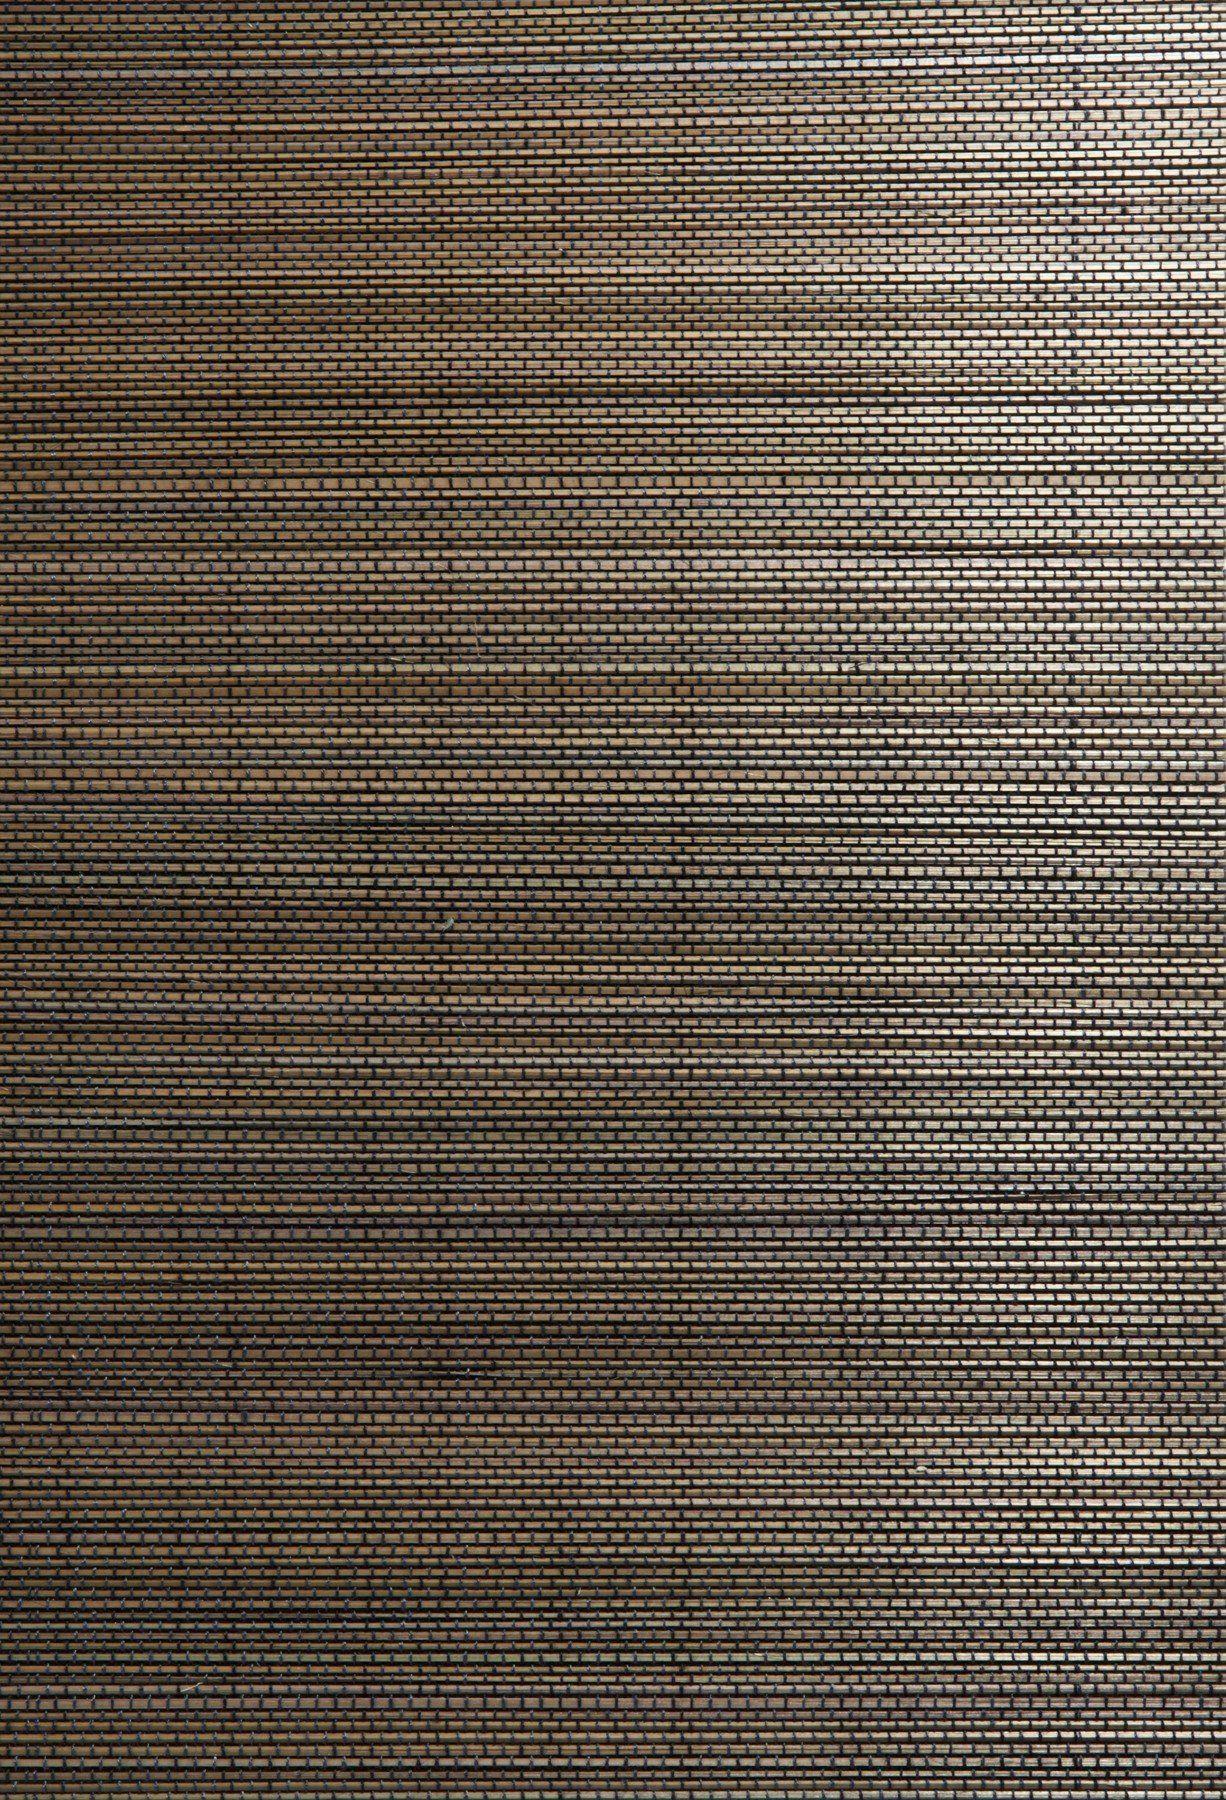 Kenneth James 63 54713 Manami Grass Cloth Wallpaper, Charcoal